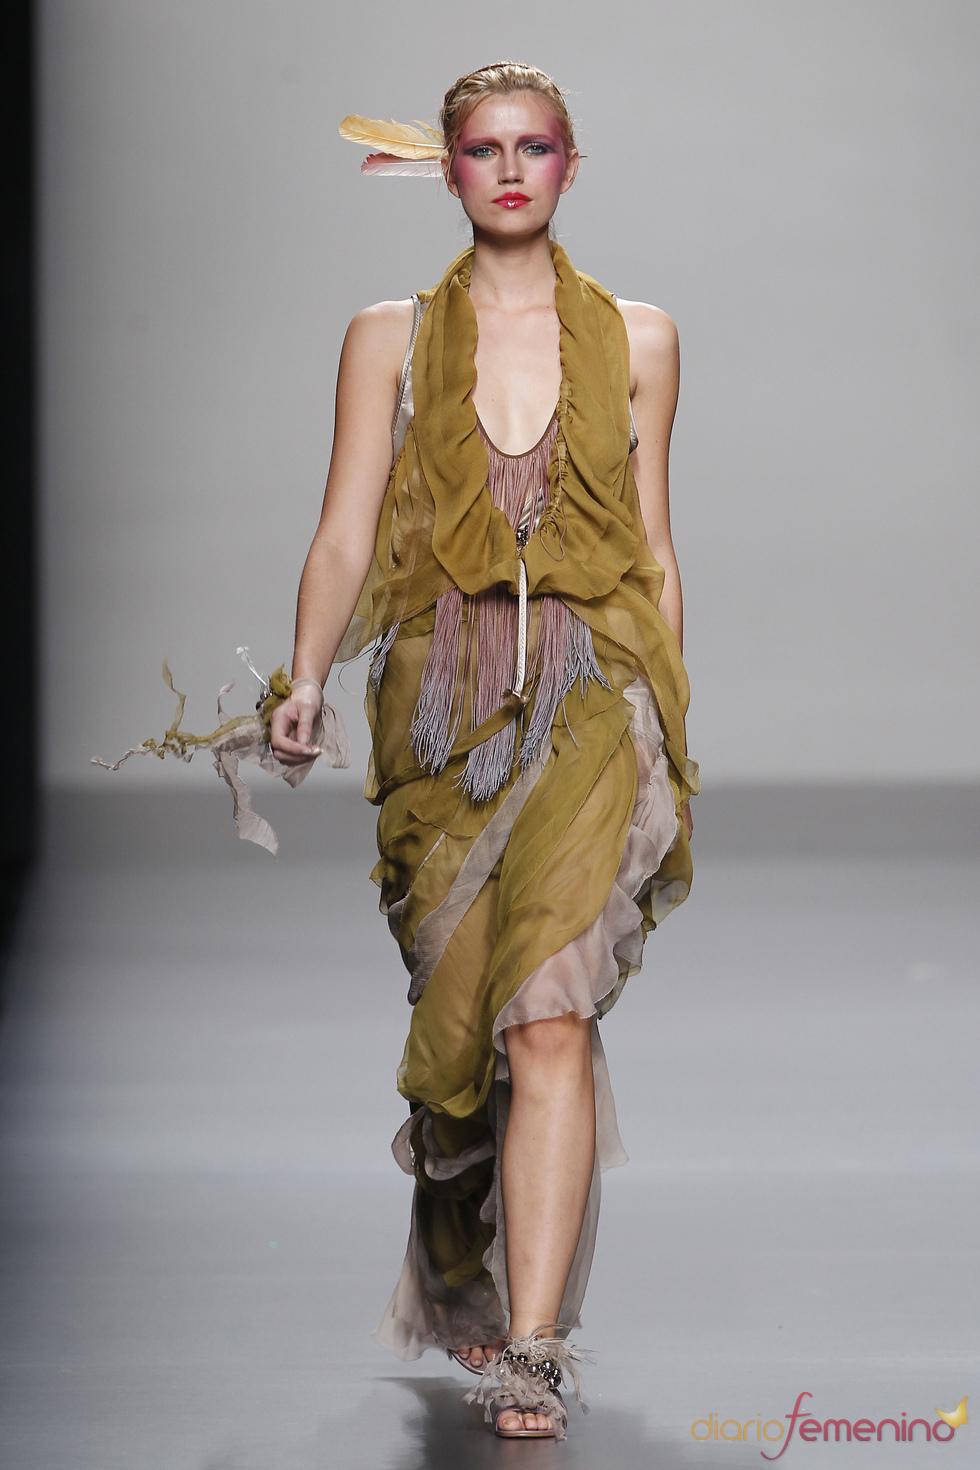 Cibeles Madrid Fashion Week 09-2010: Victorio & Lucchino